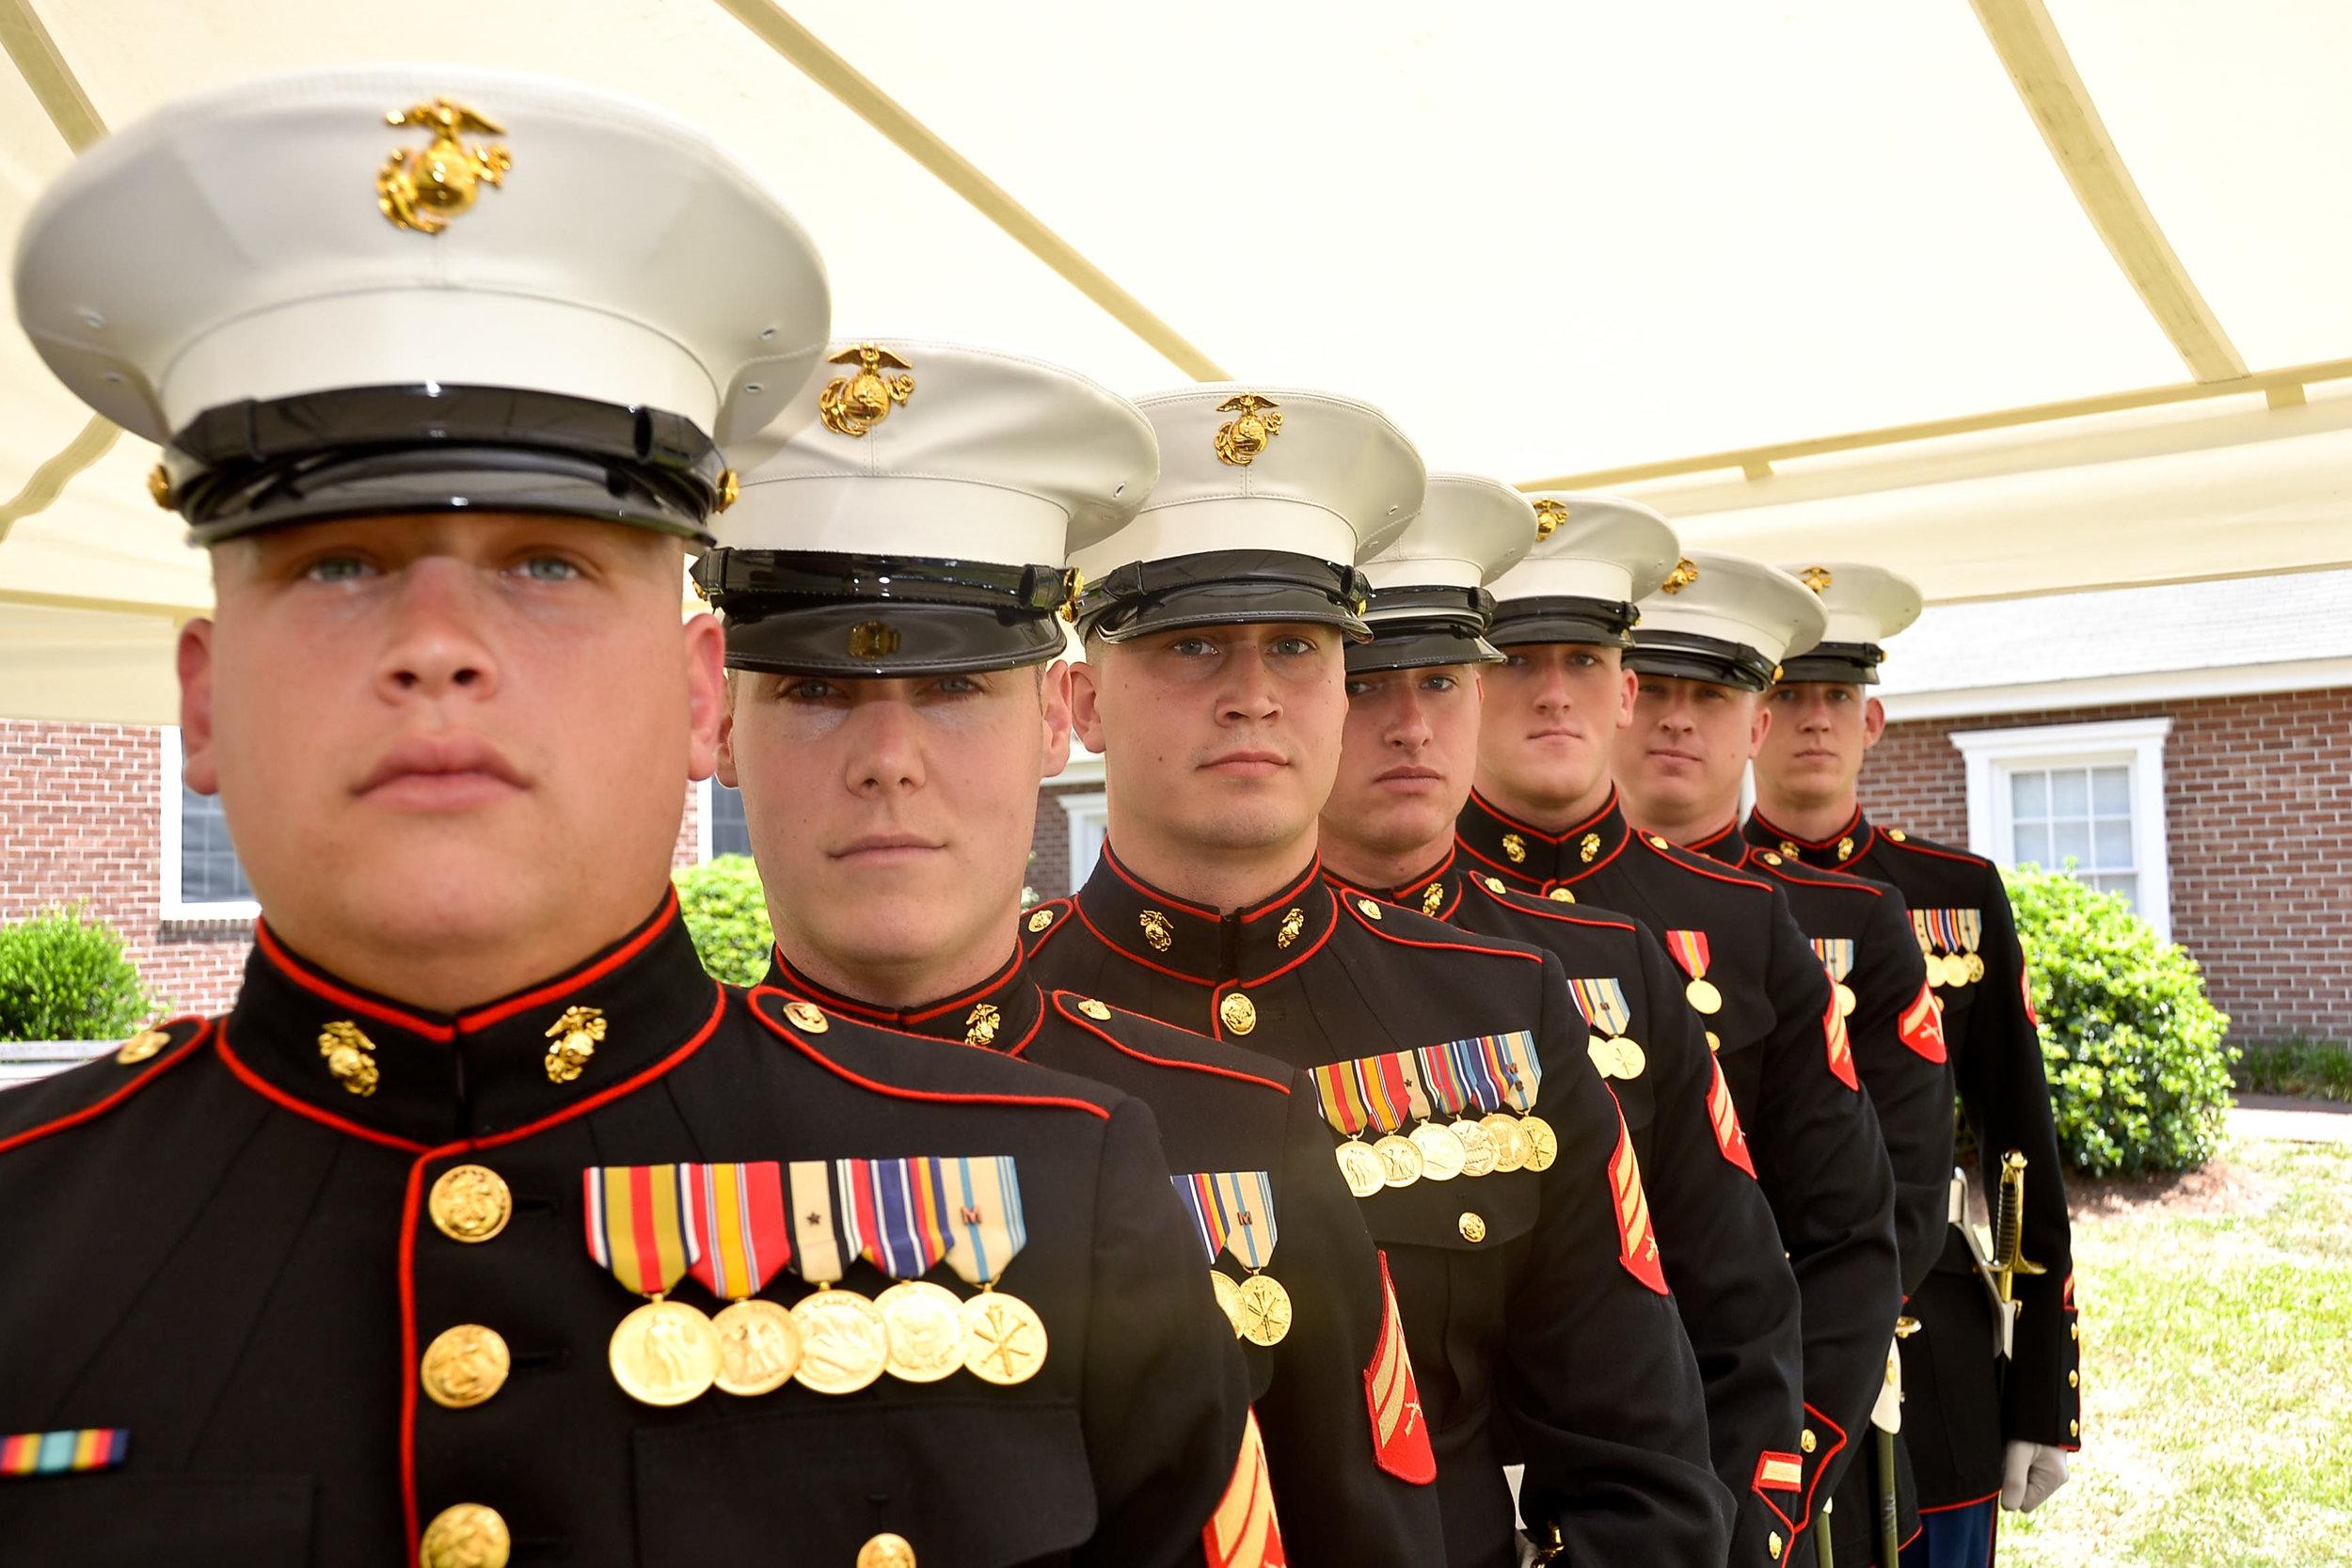 Marine groom and groomsmen.